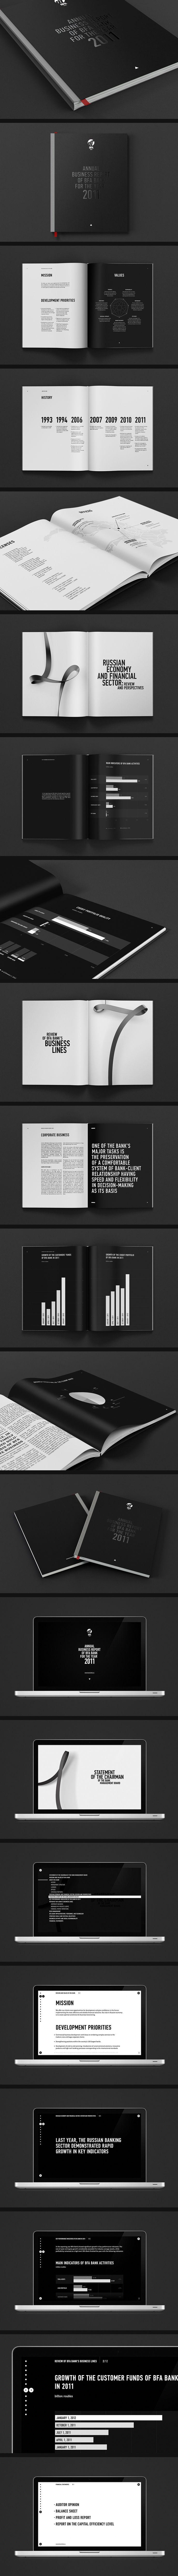 black on black :: spot varnish 2011 Annual Report for BFA Bank on Behance